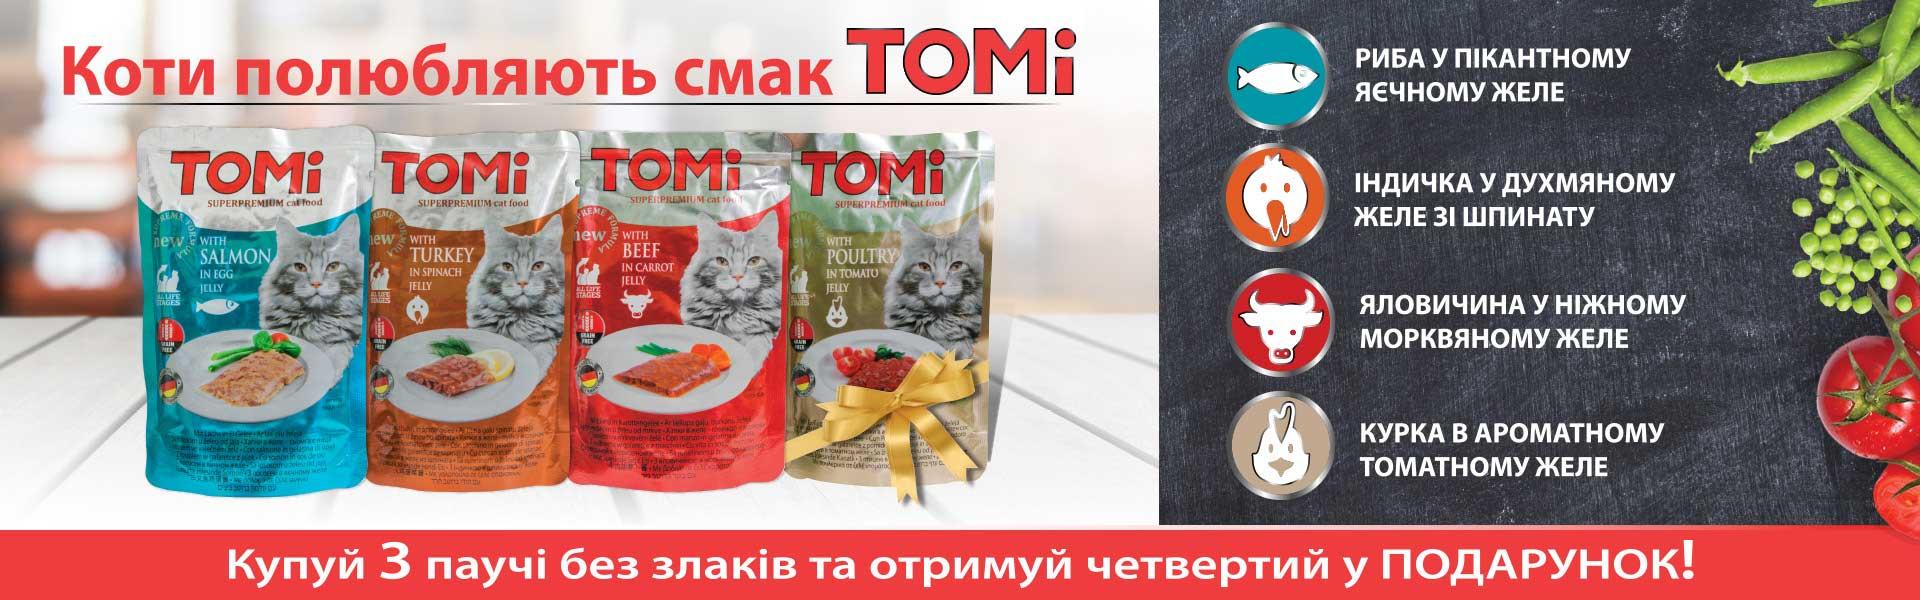 TOMi акция 3 + 1